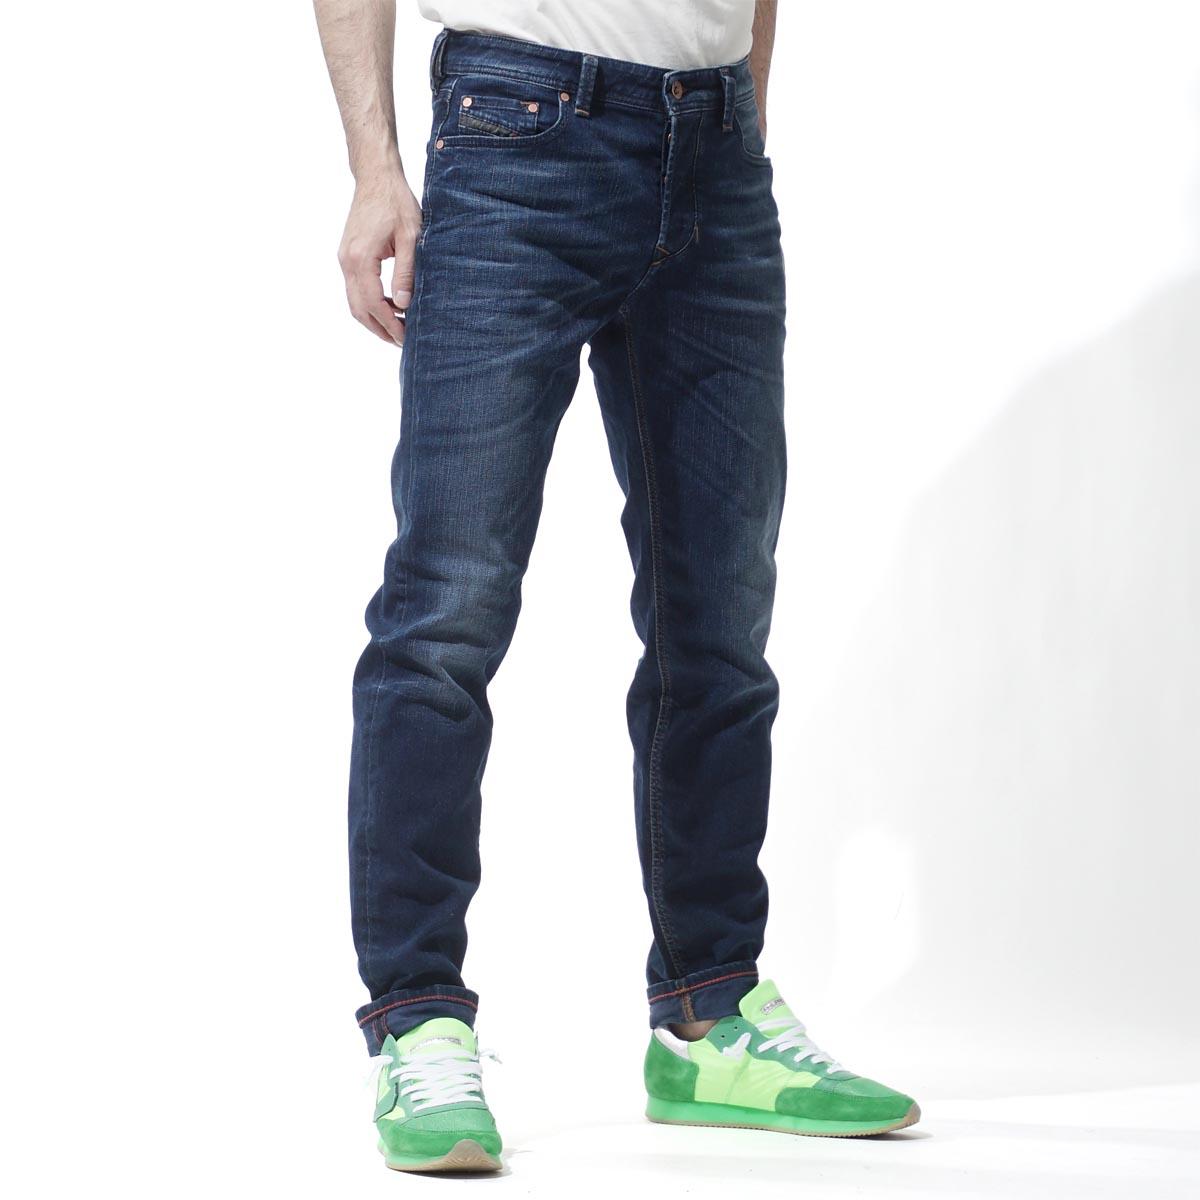 柴油DIESEL按鈕油炸食品牛仔褲LARKEE REGULAR STRAIGHT INDIGO藍色派larkee beex 00su1x 084dr人